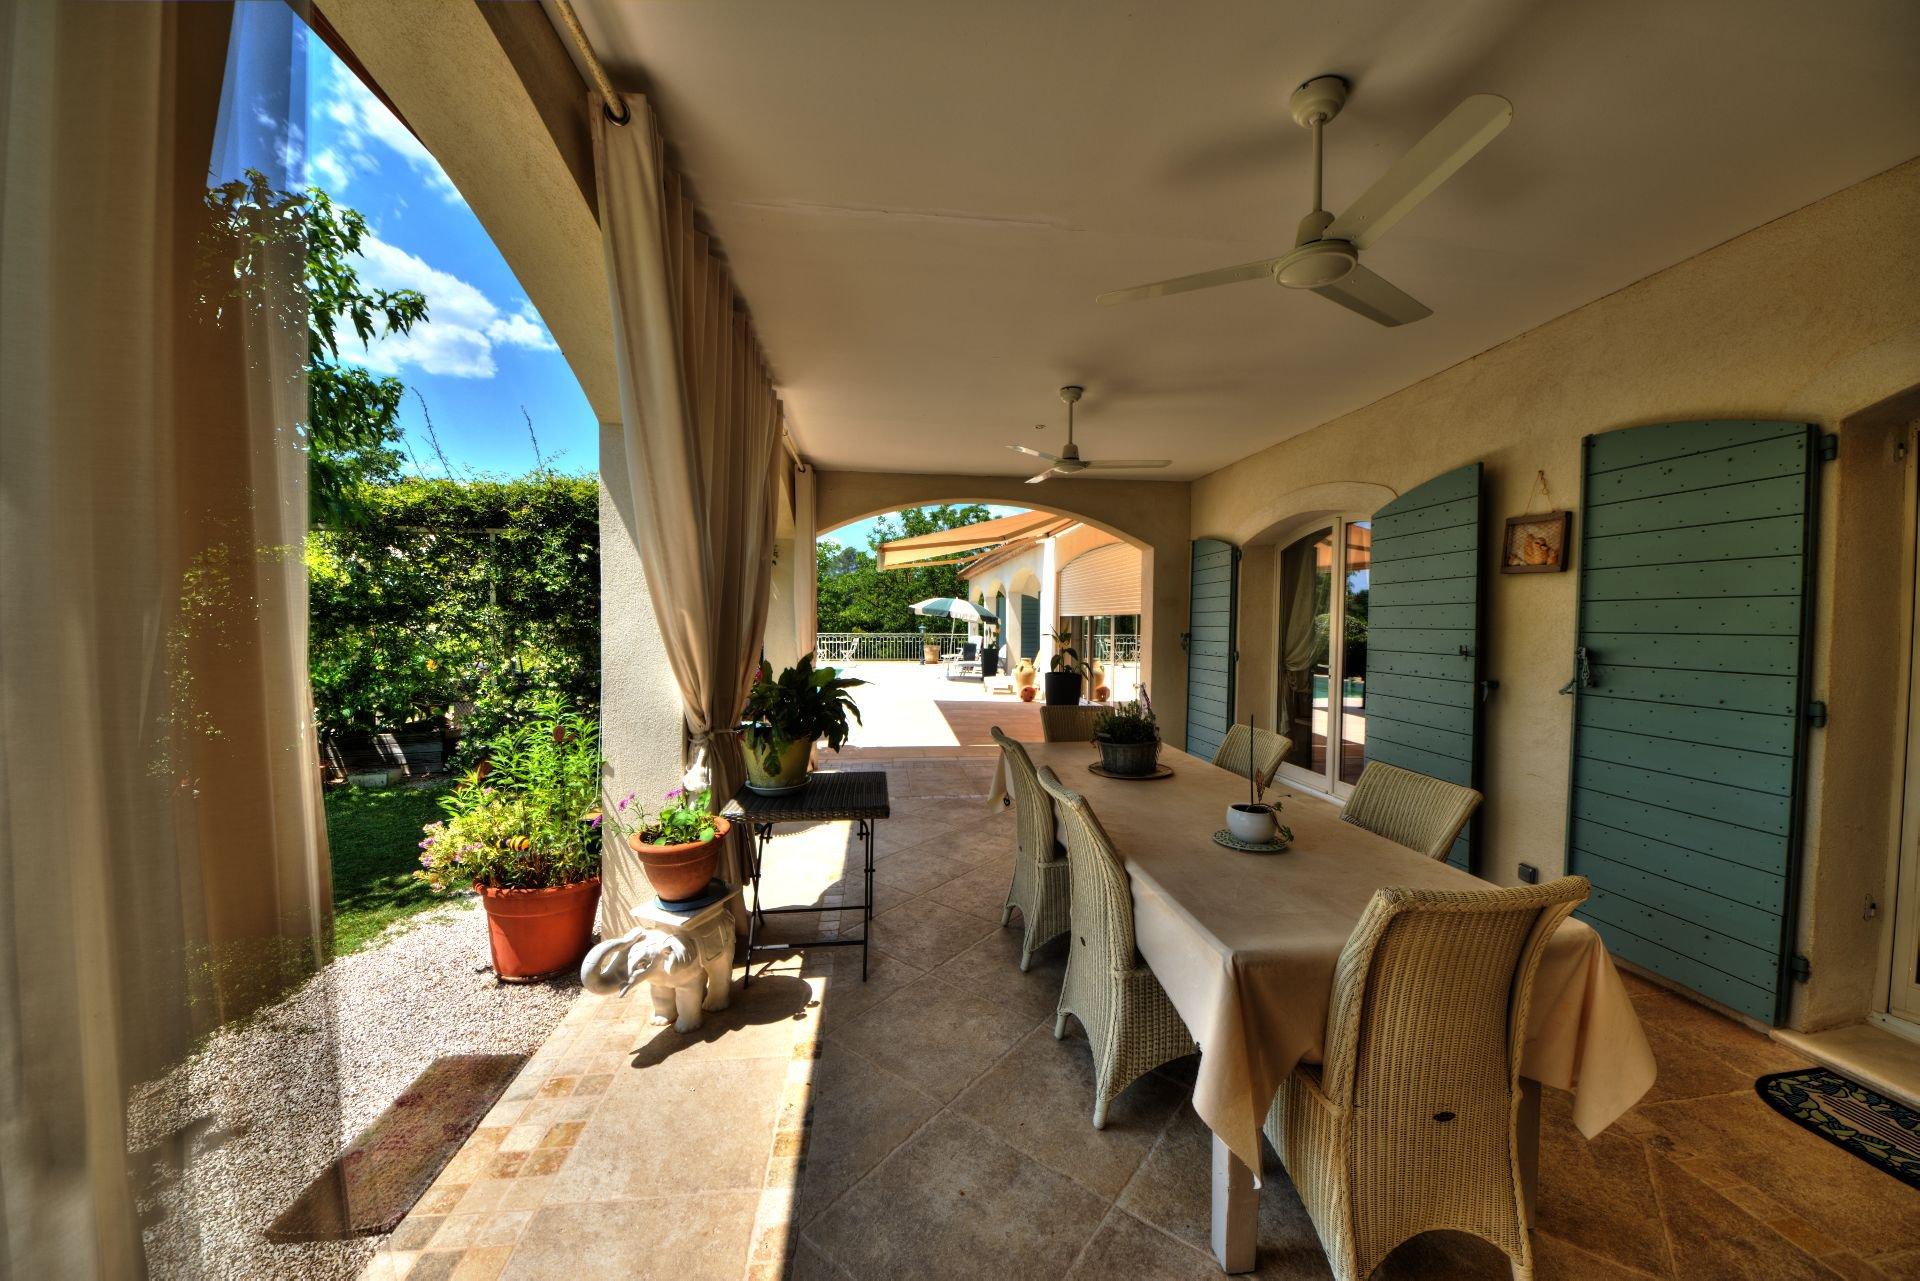 Superbe villa de luxe avec piscine Villecroze